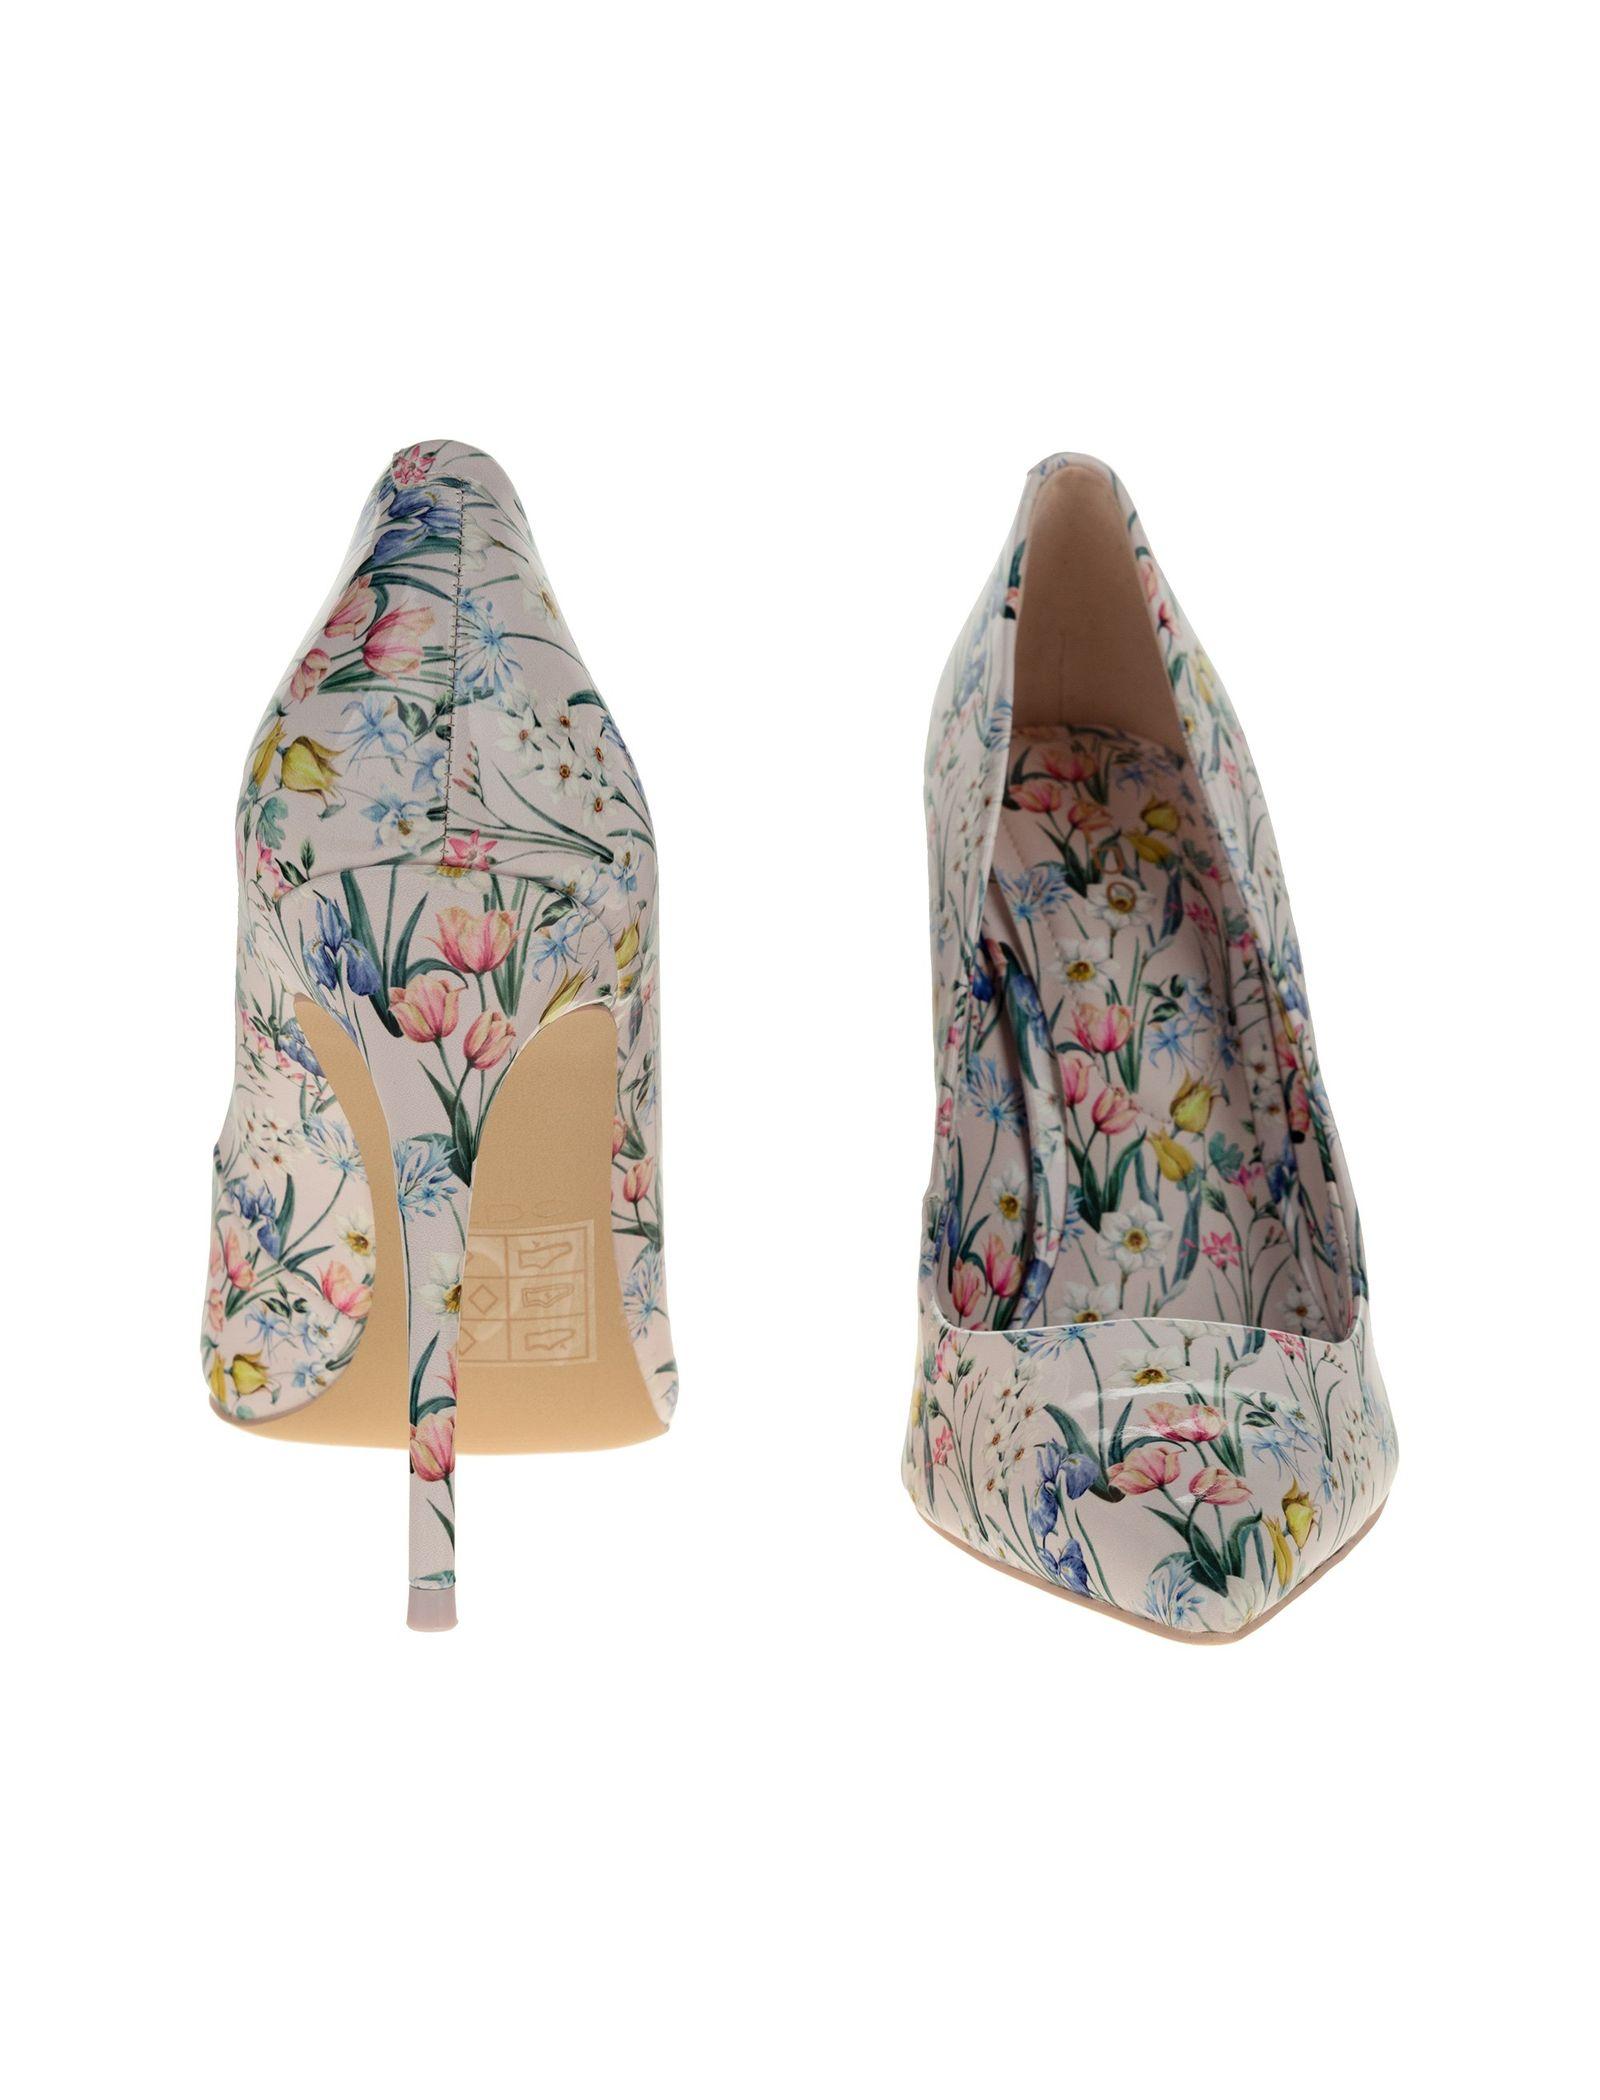 کفش پاشنه بلند زنانه - آلدو - صورتي  - 5